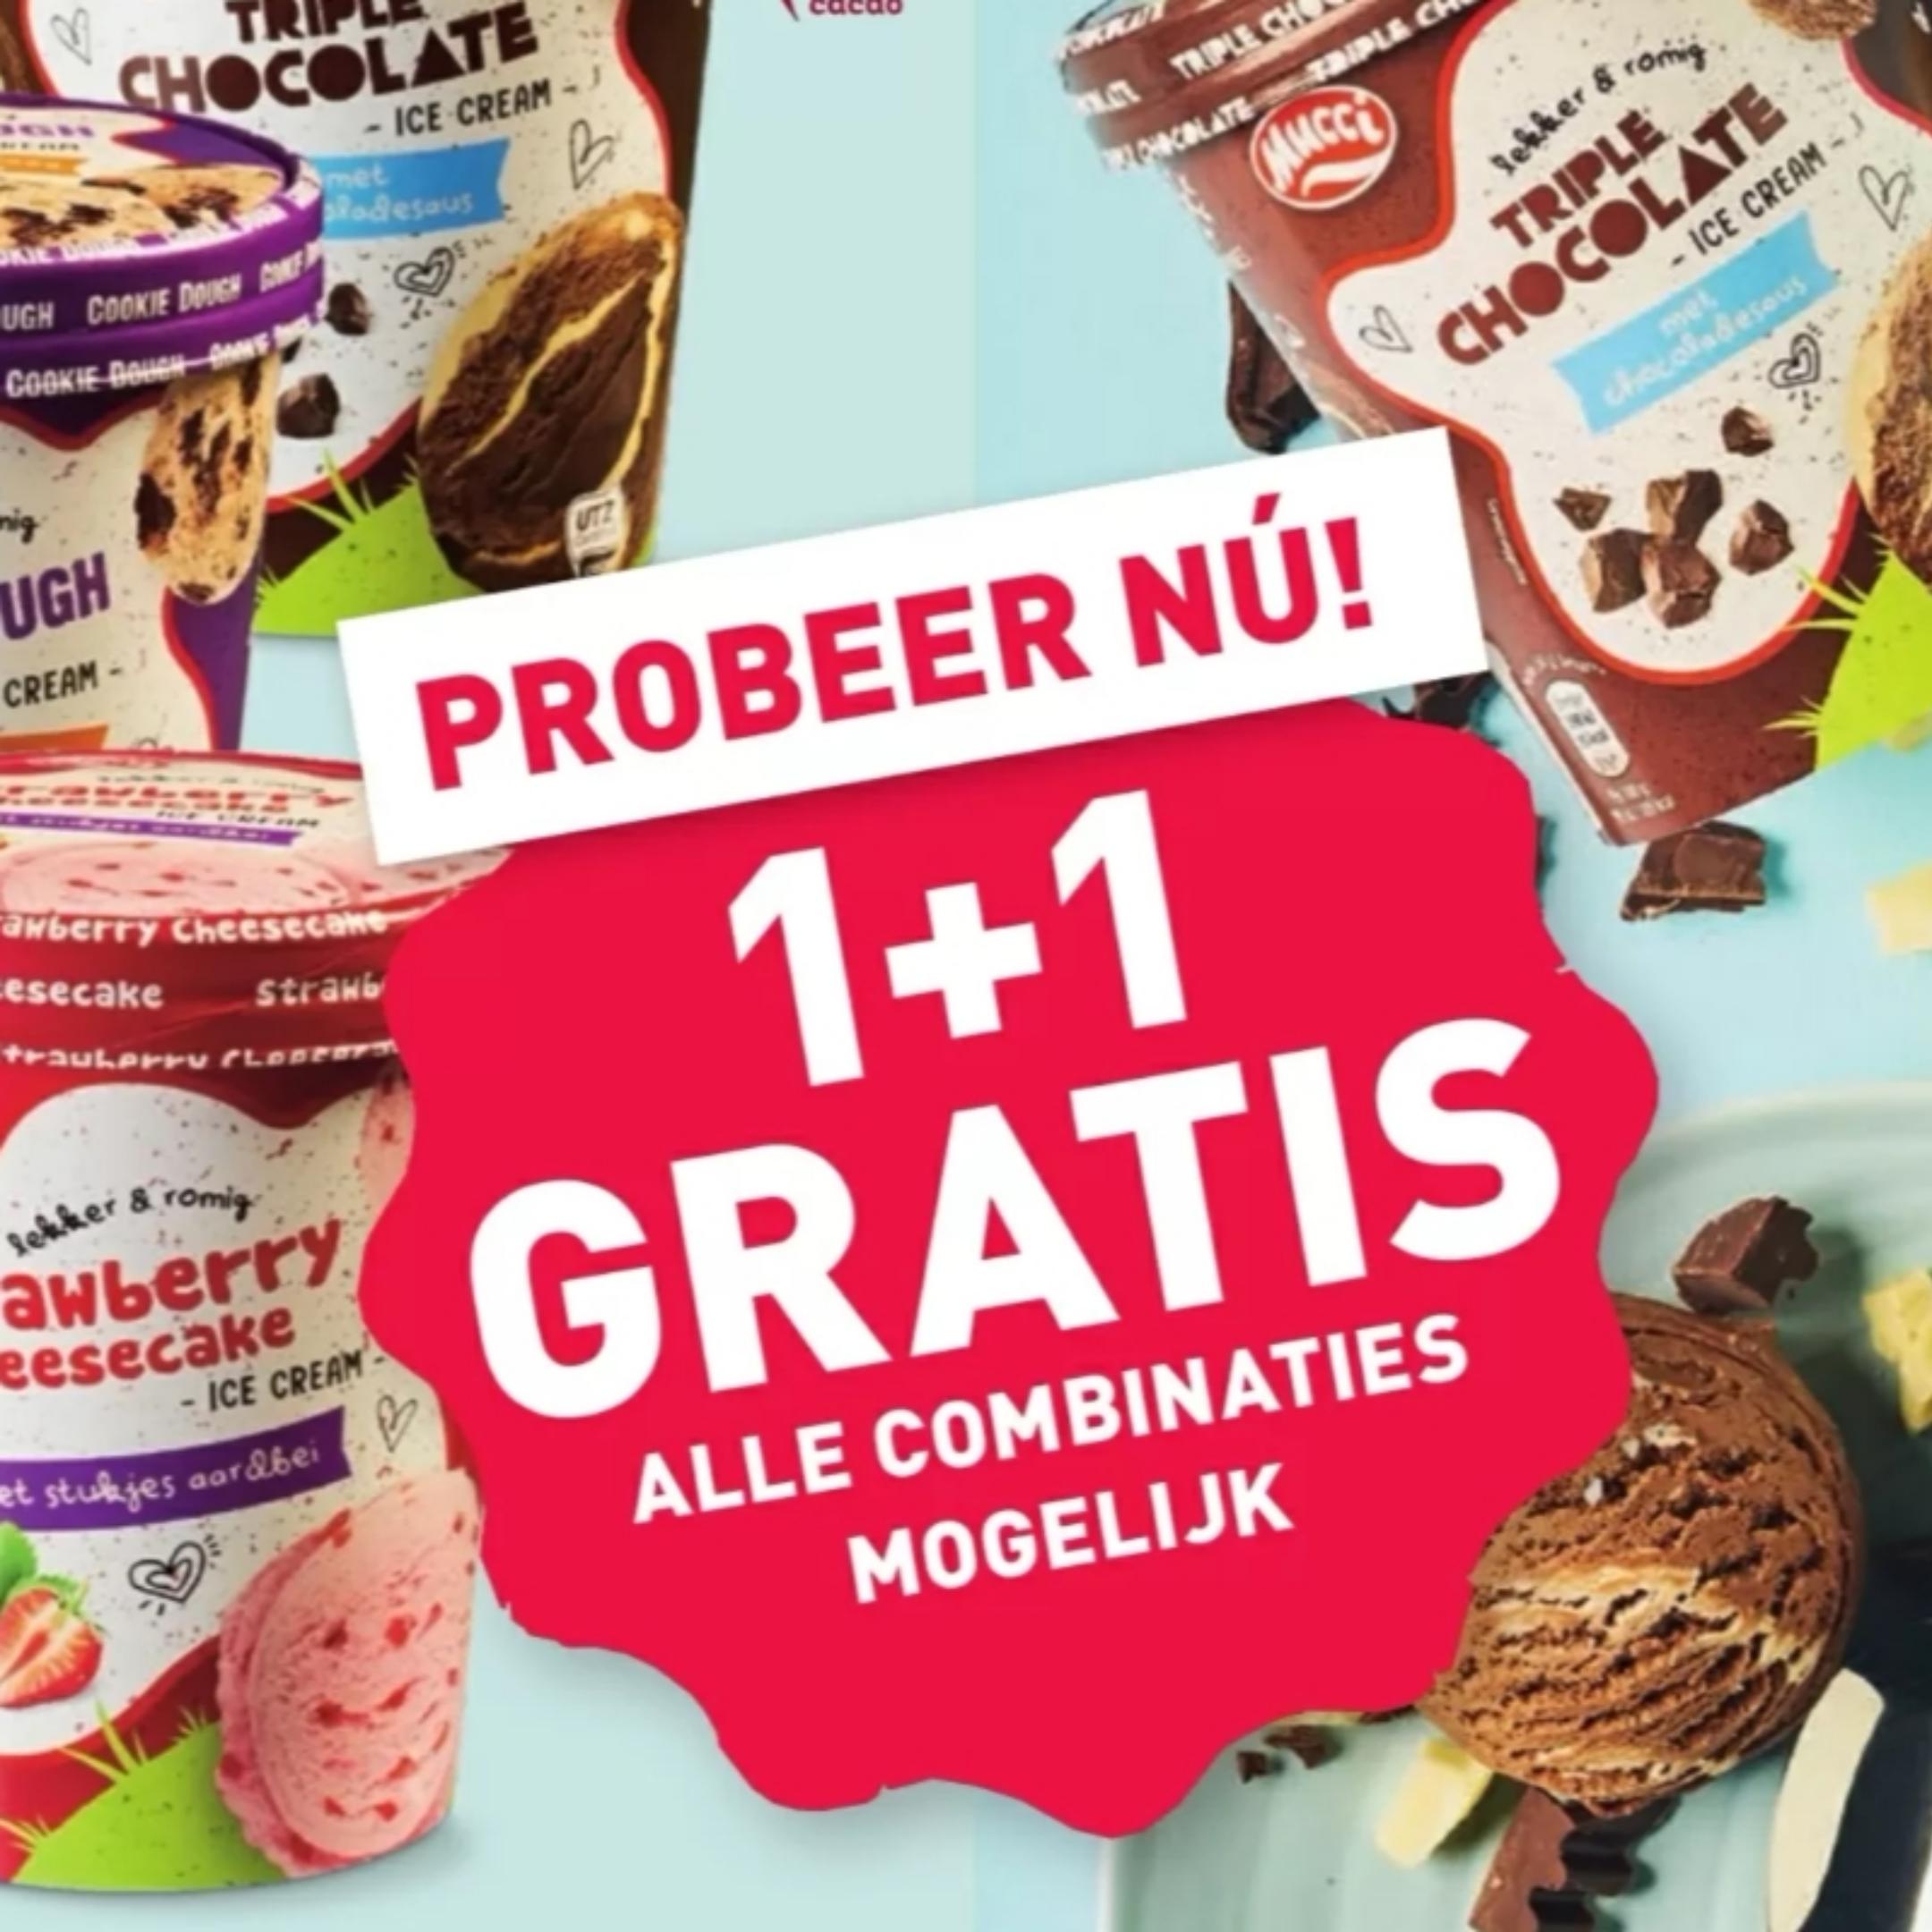 (1+1 gratis) IJsbekers 500 ml @Aldi